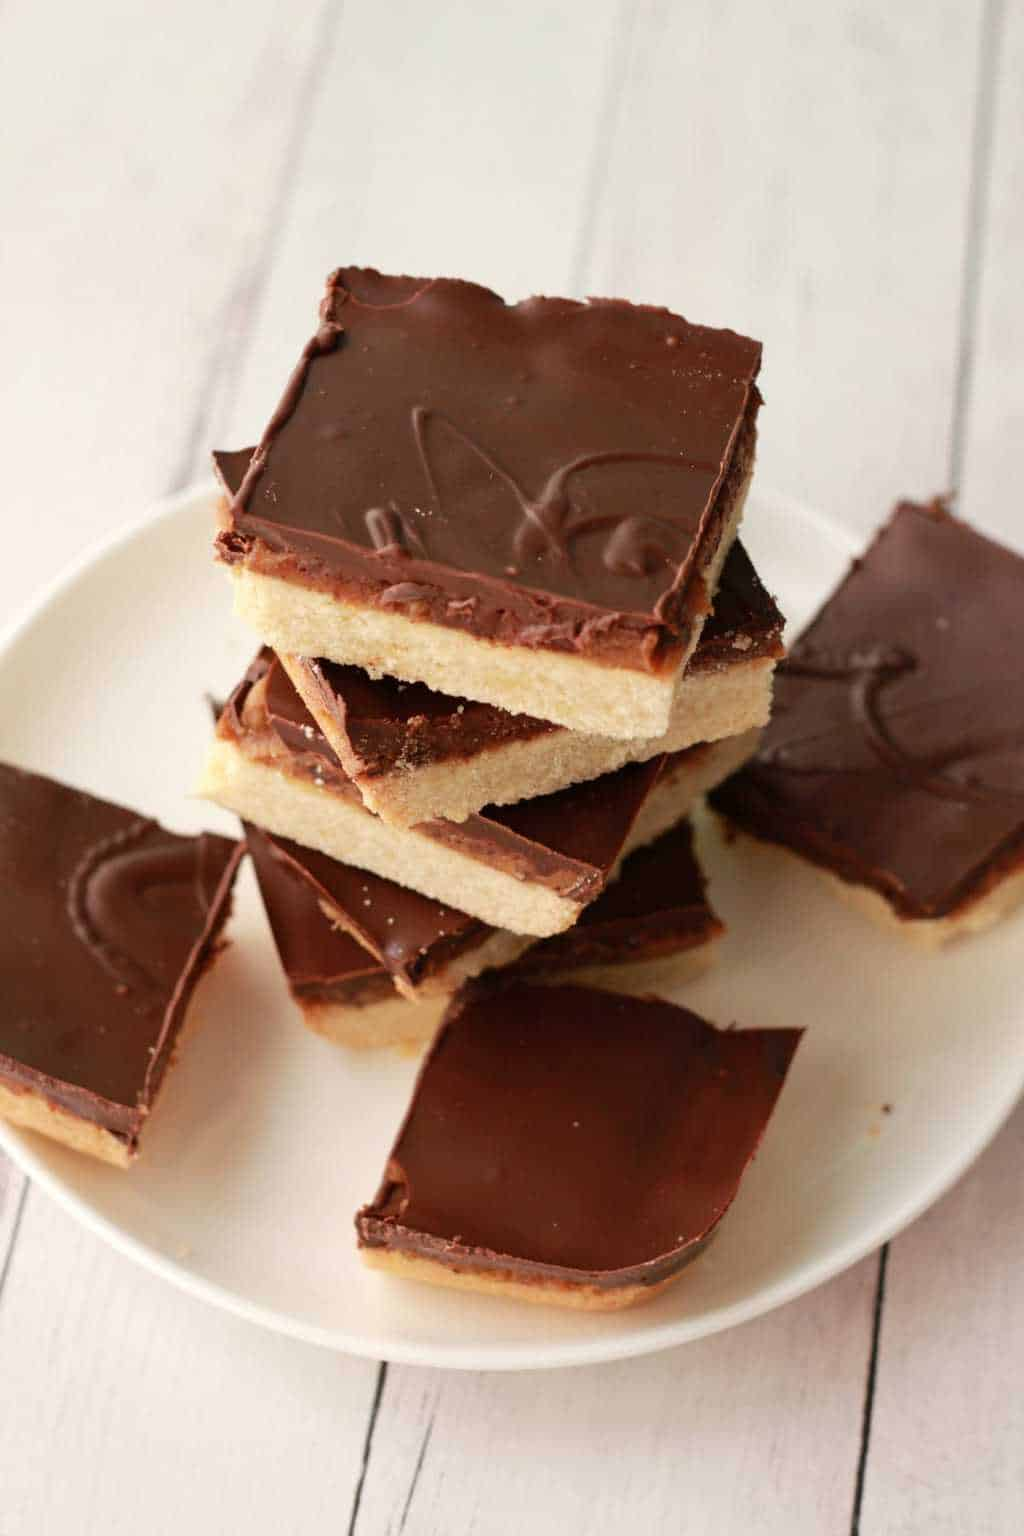 ... Vegan Homemade Twix Bars - a crunchy shortbread base, date caramel center and dark chocolate